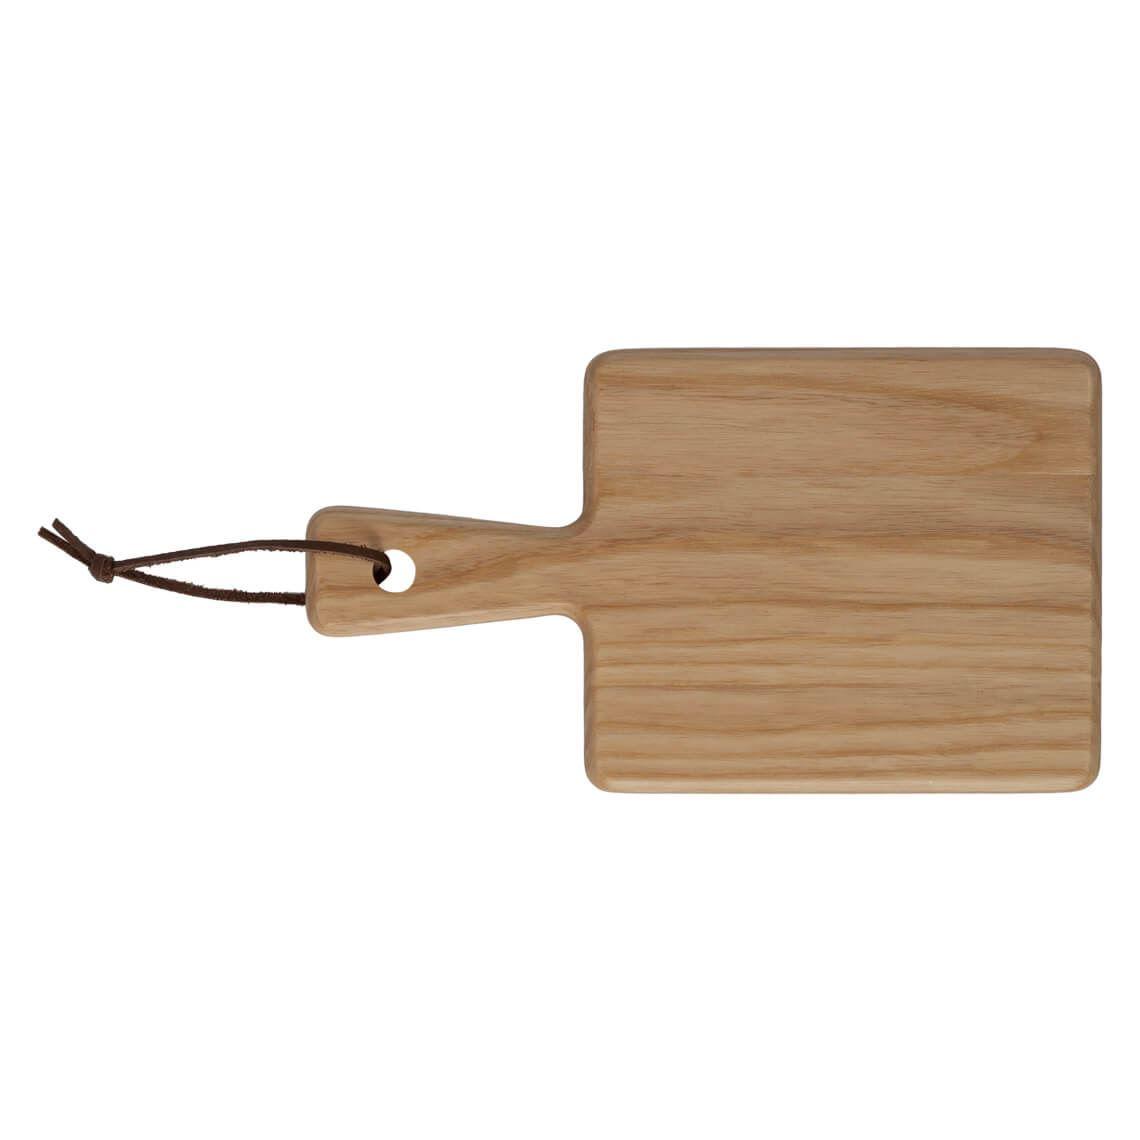 Bolu Serving Board Size W 23cm x D 13cm x H 2cm in Natural Ash Wood Freedom